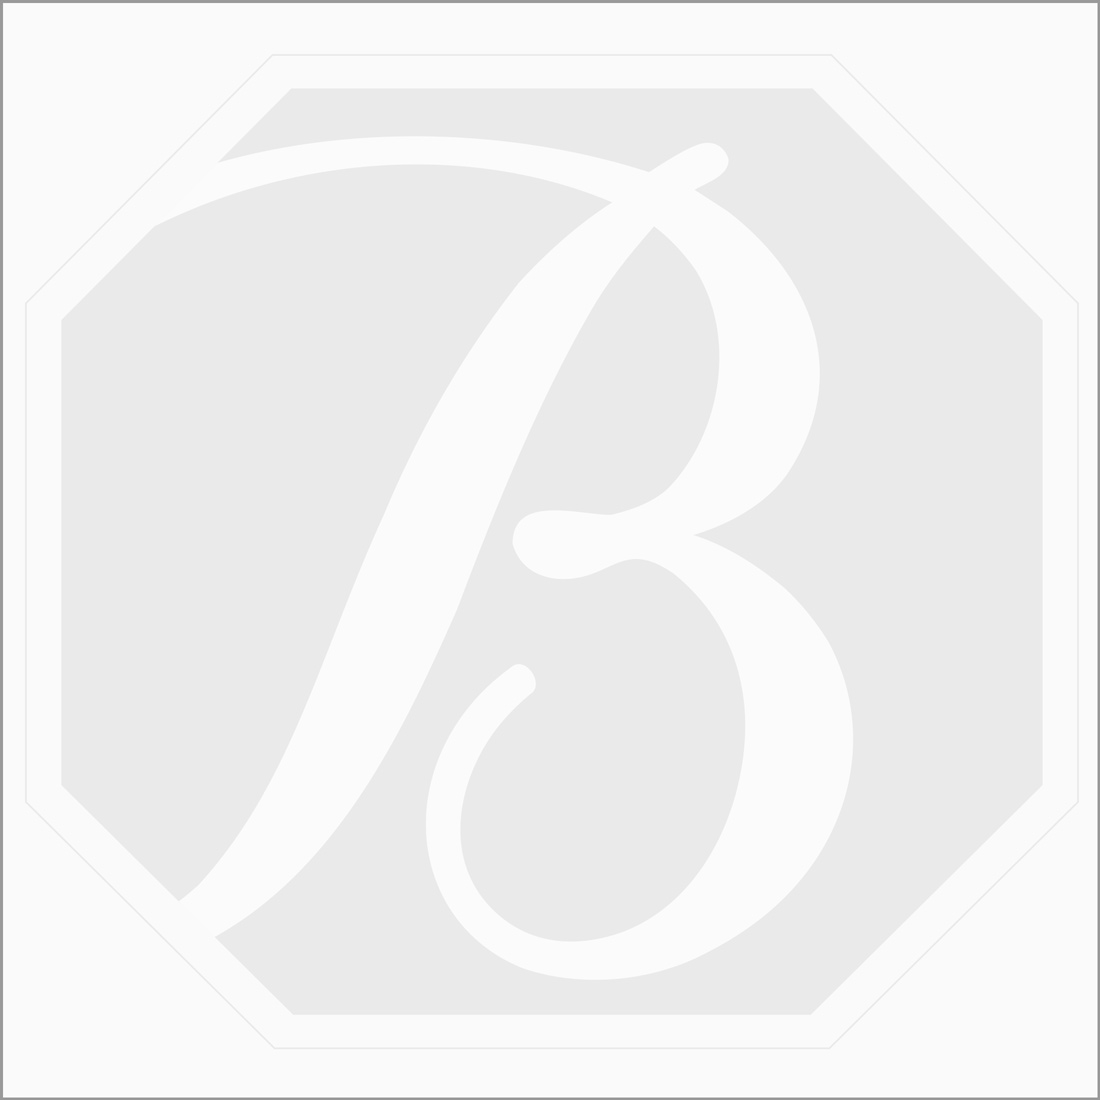 5 Pieces - Medium Tones Multi-Sapphire Rose Cut - 16 x 11.50 mm to 17 x 13.50 mm - 70.83 carats (MSRC1307)